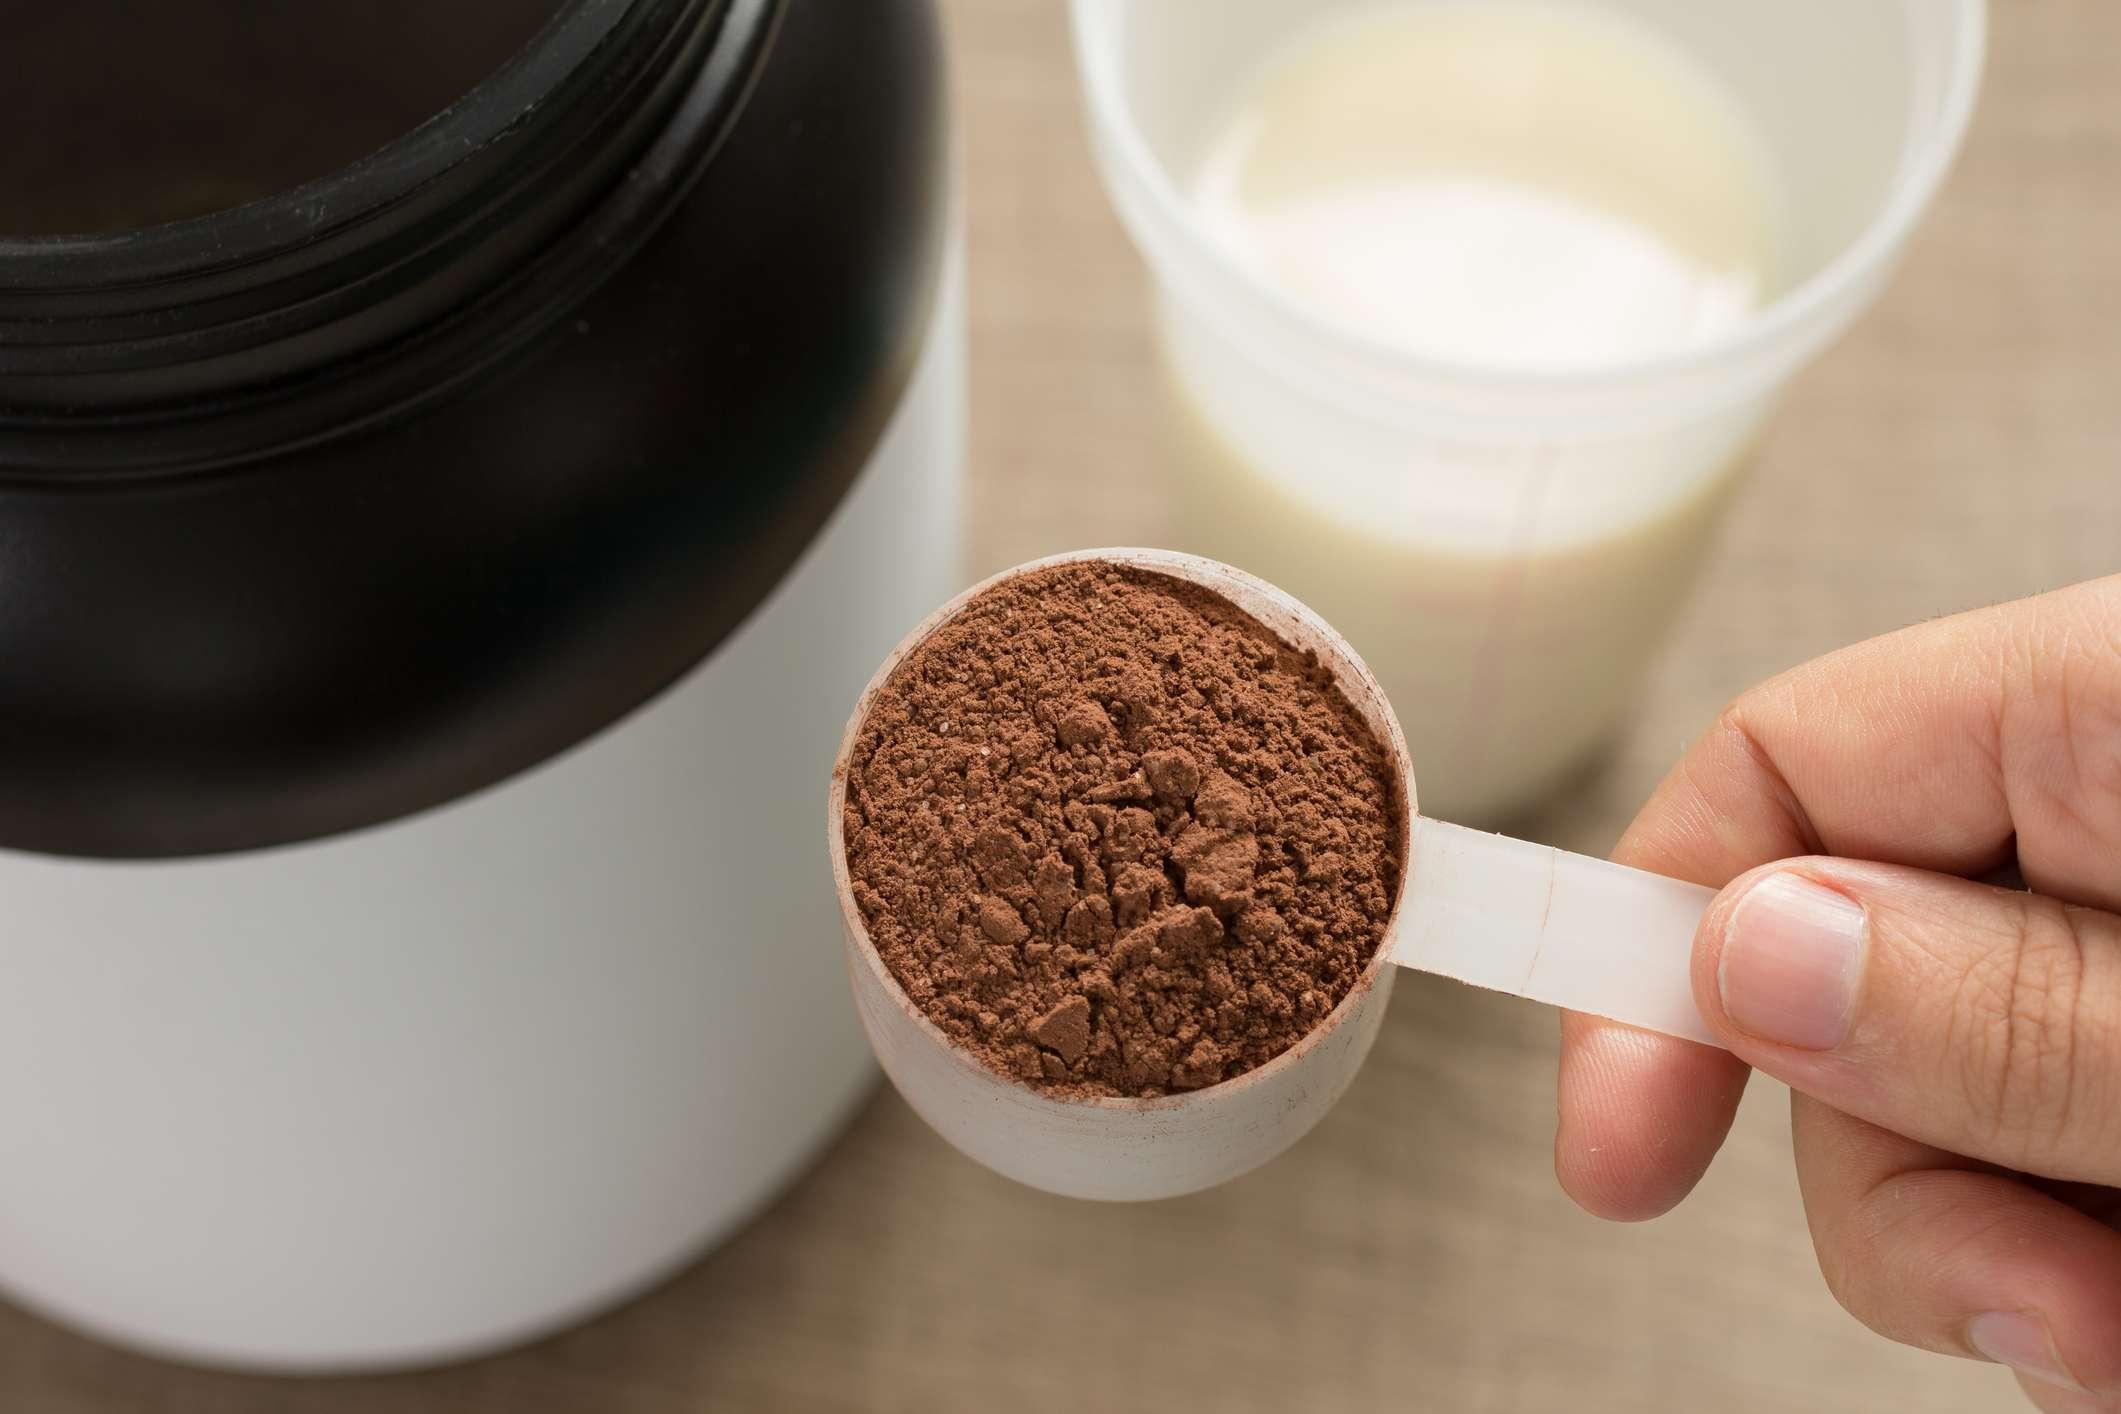 Chocolate-flavored protein powder with casein